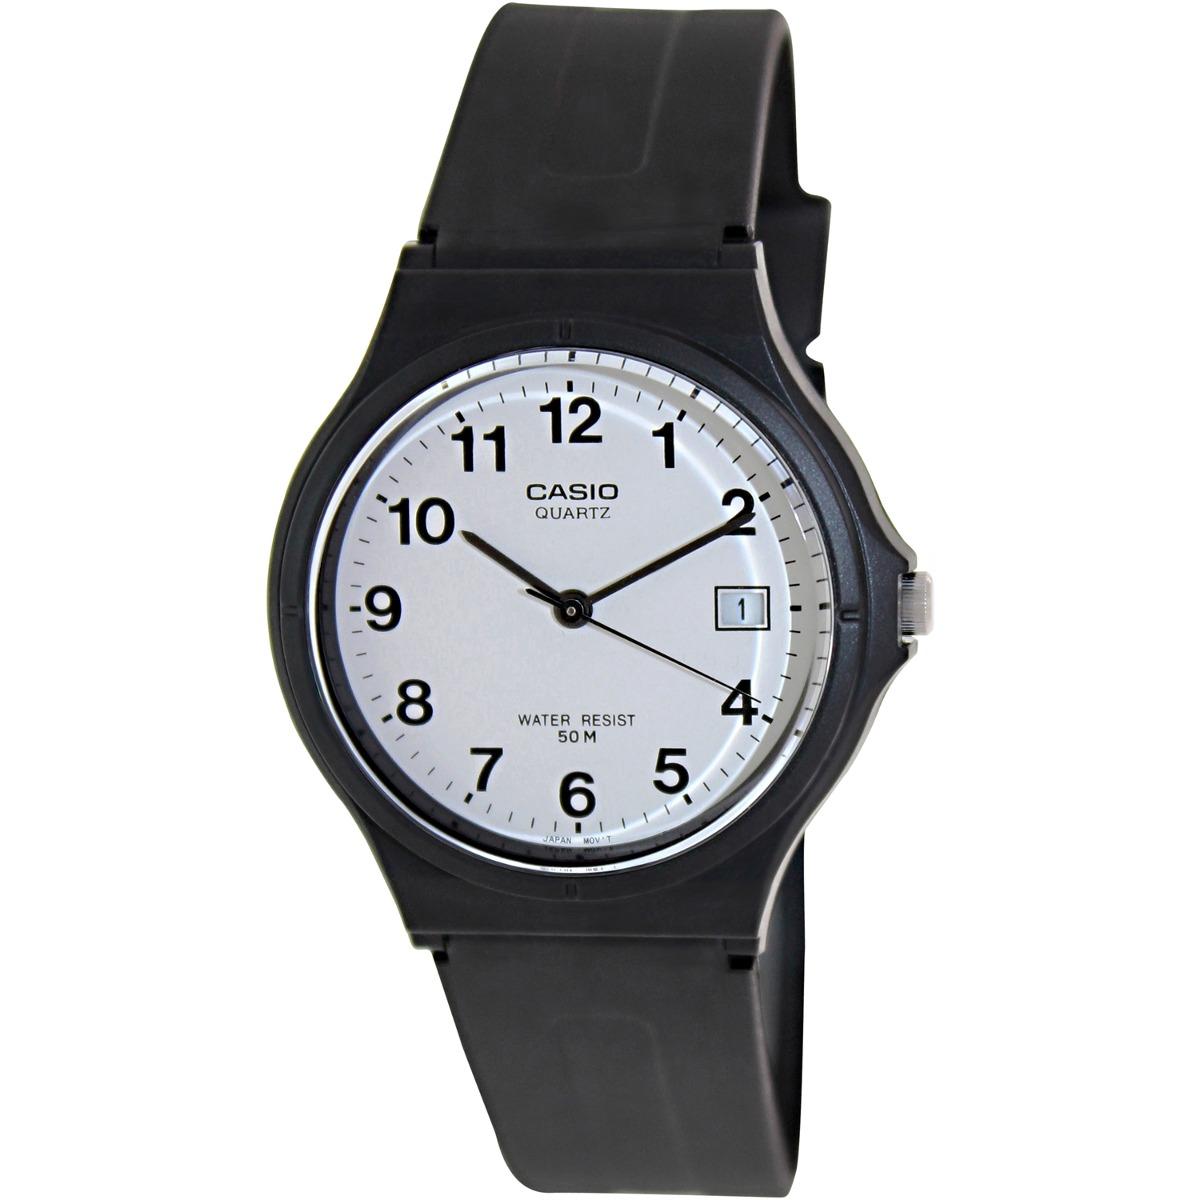 7bv Mujer Mw59 Casio Para Reloj Negro HED9I2YW